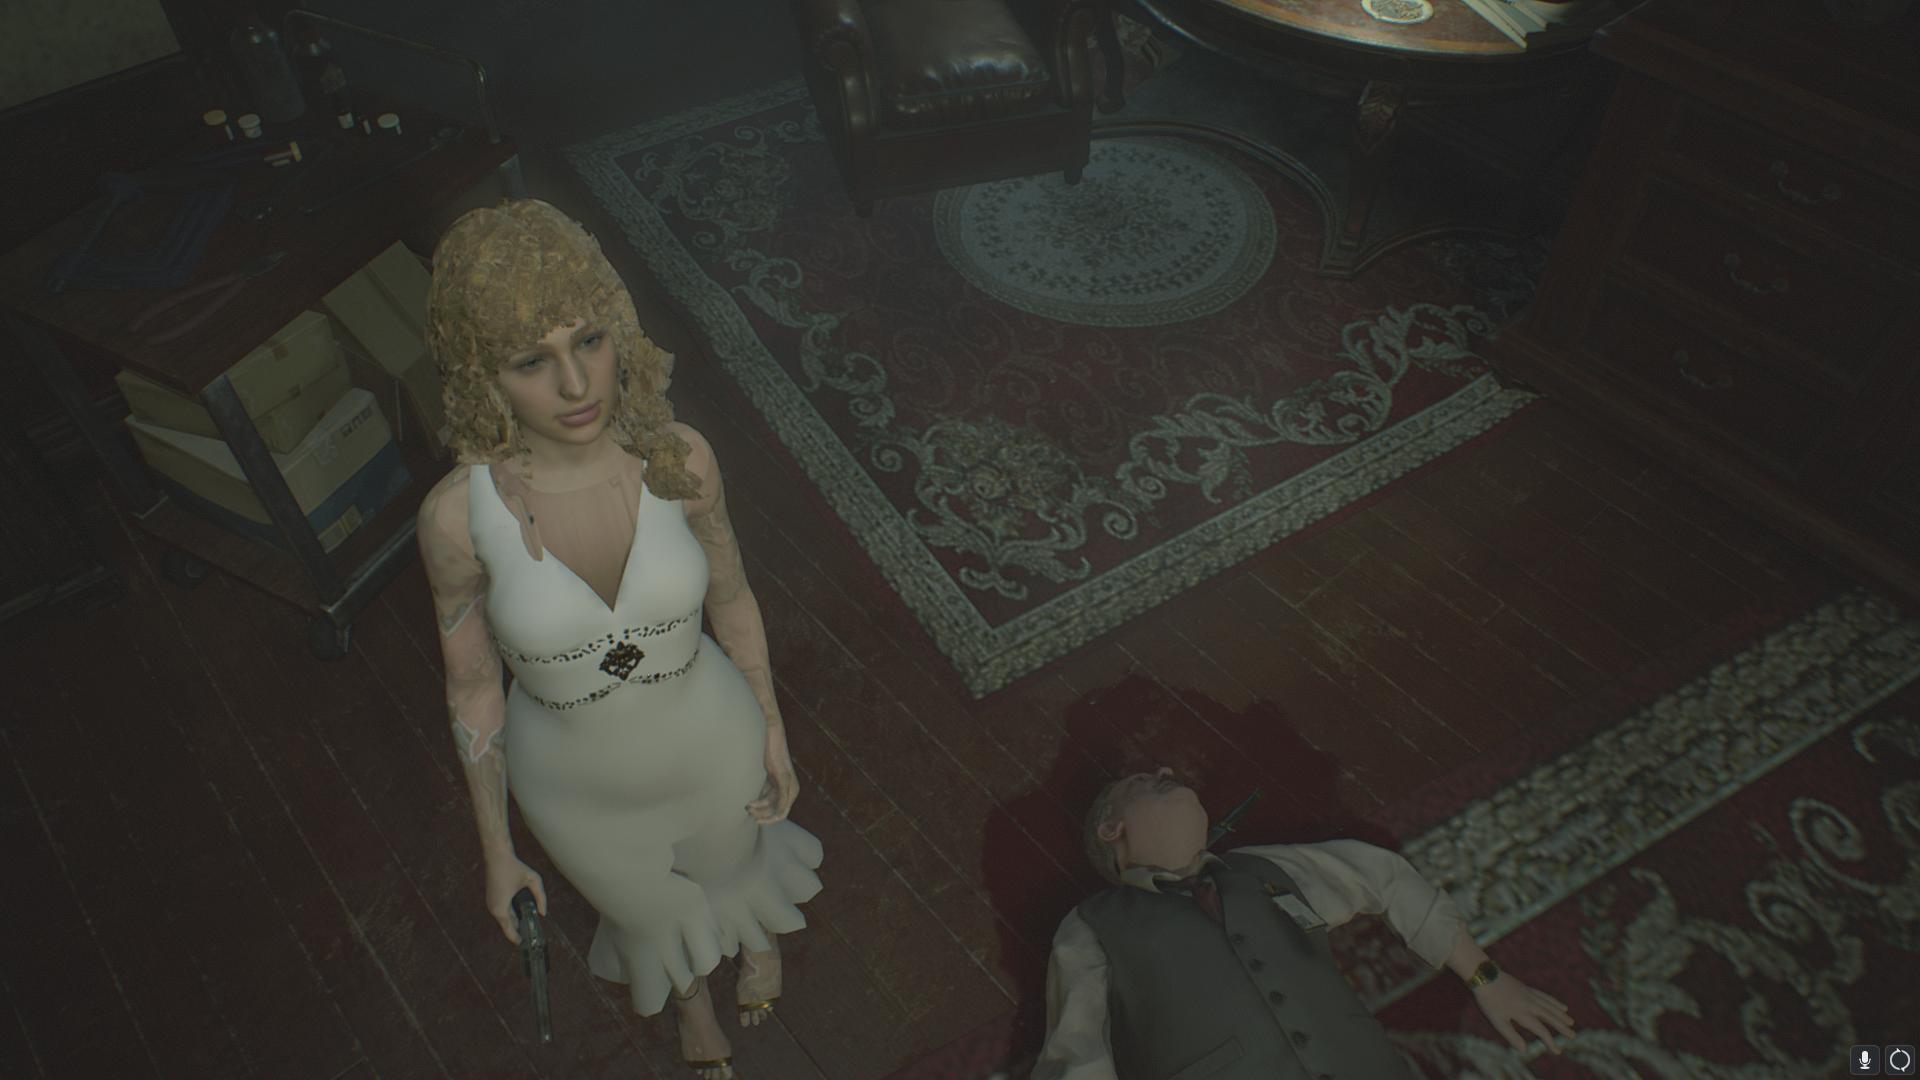 katherine warren original dress: